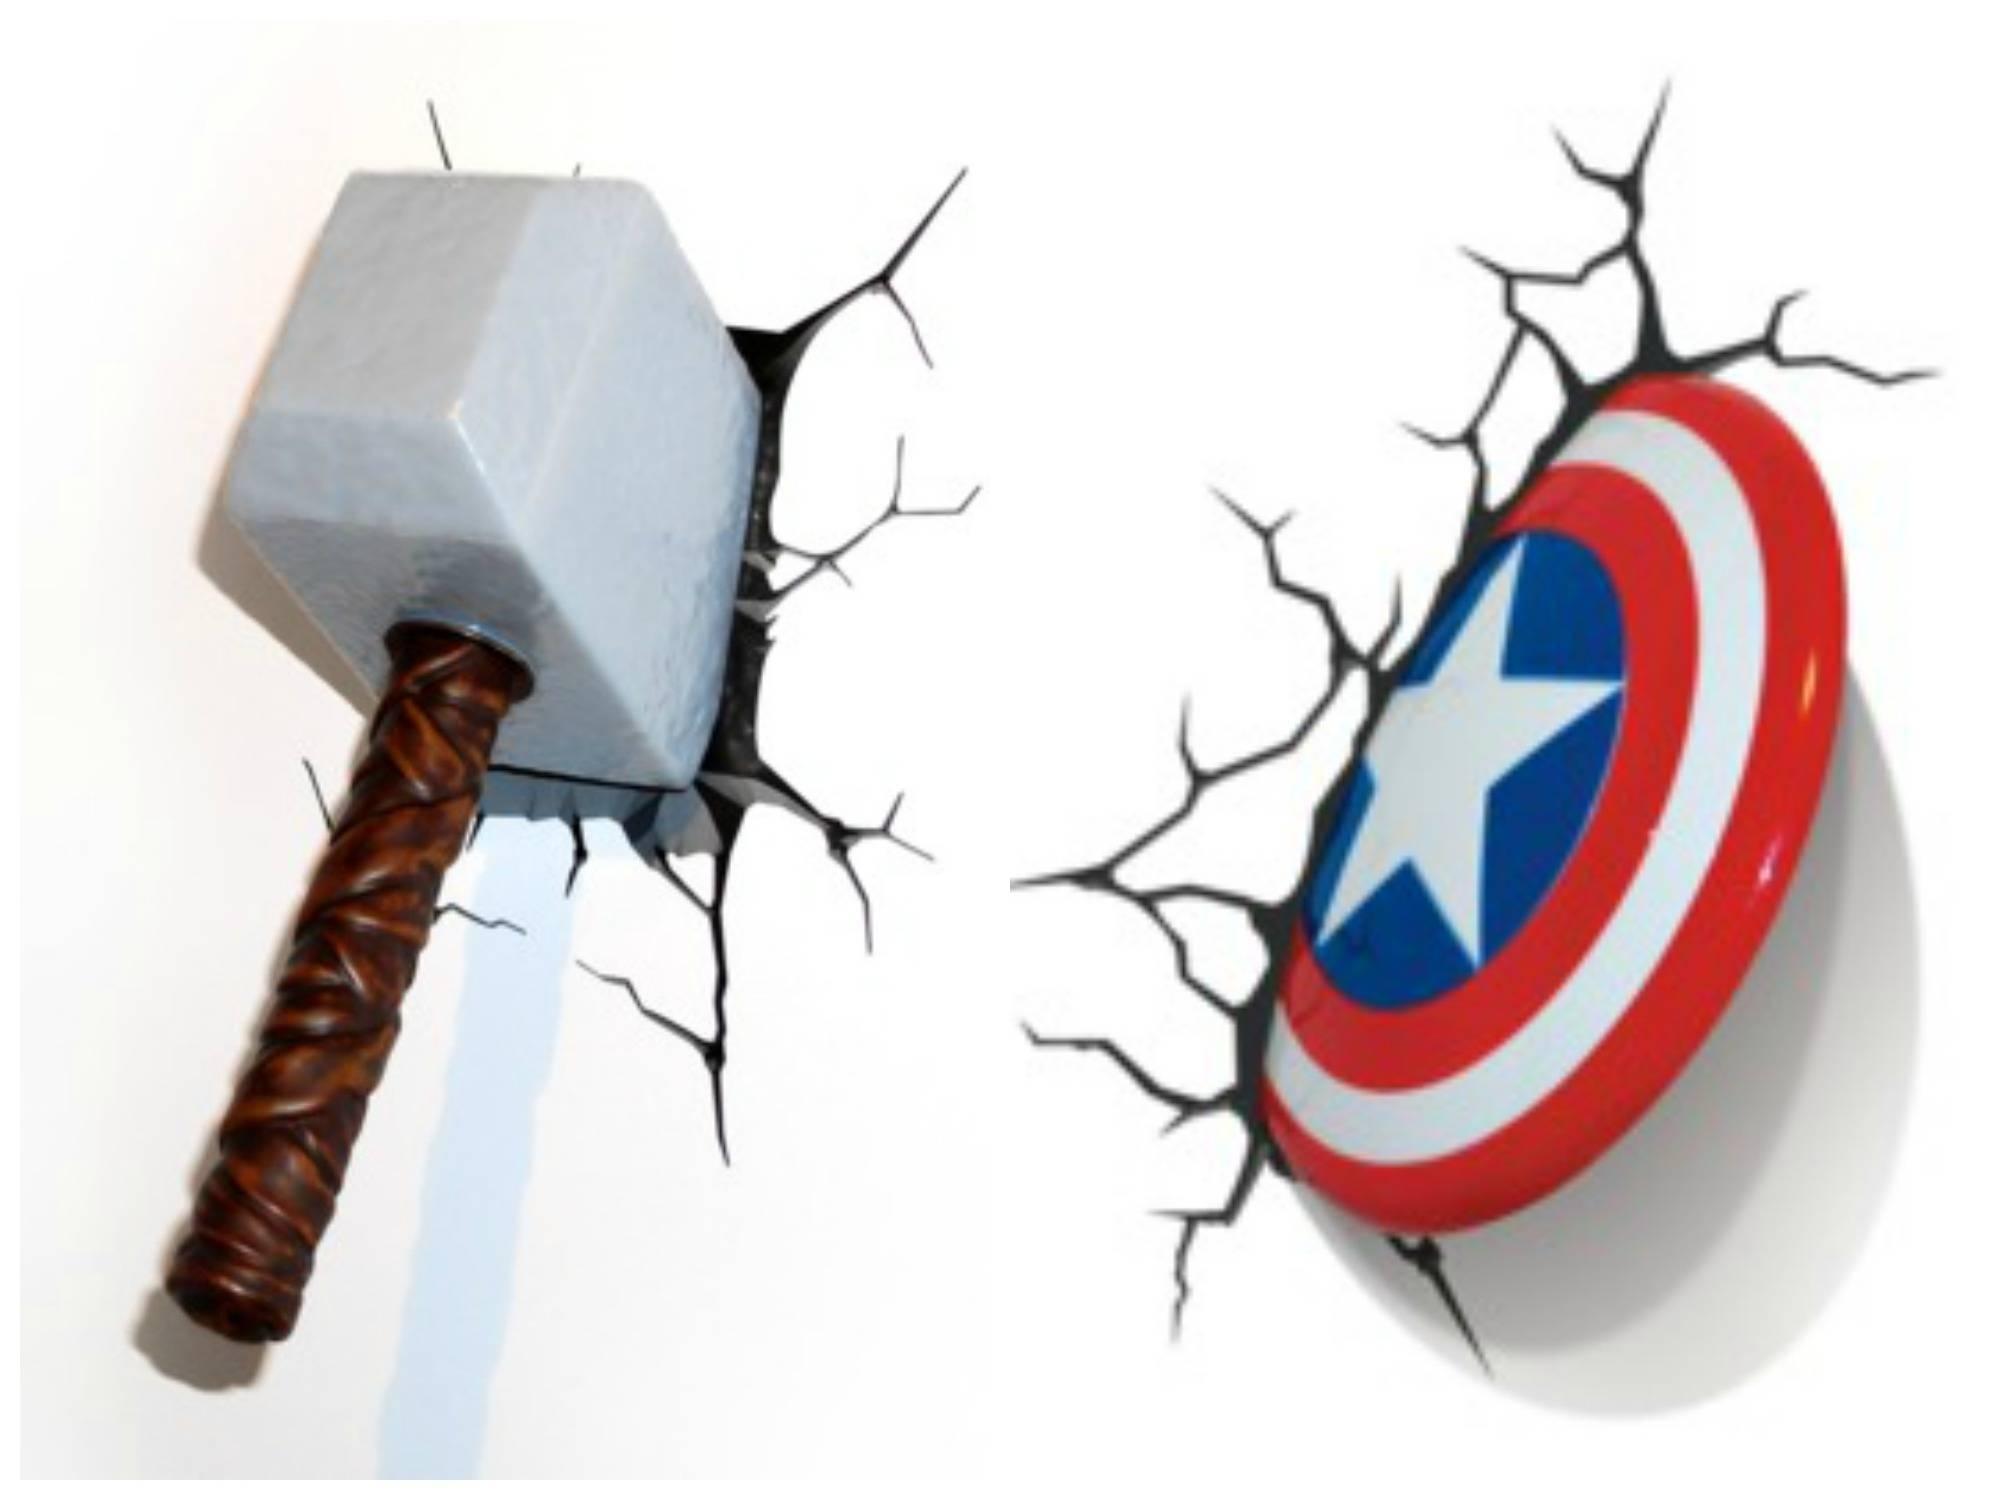 3d Wall Art Thor Hammer Night Light Uk | Wallartideas Inside Latest Thor Hammer 3d Wall Art (Gallery 6 of 20)